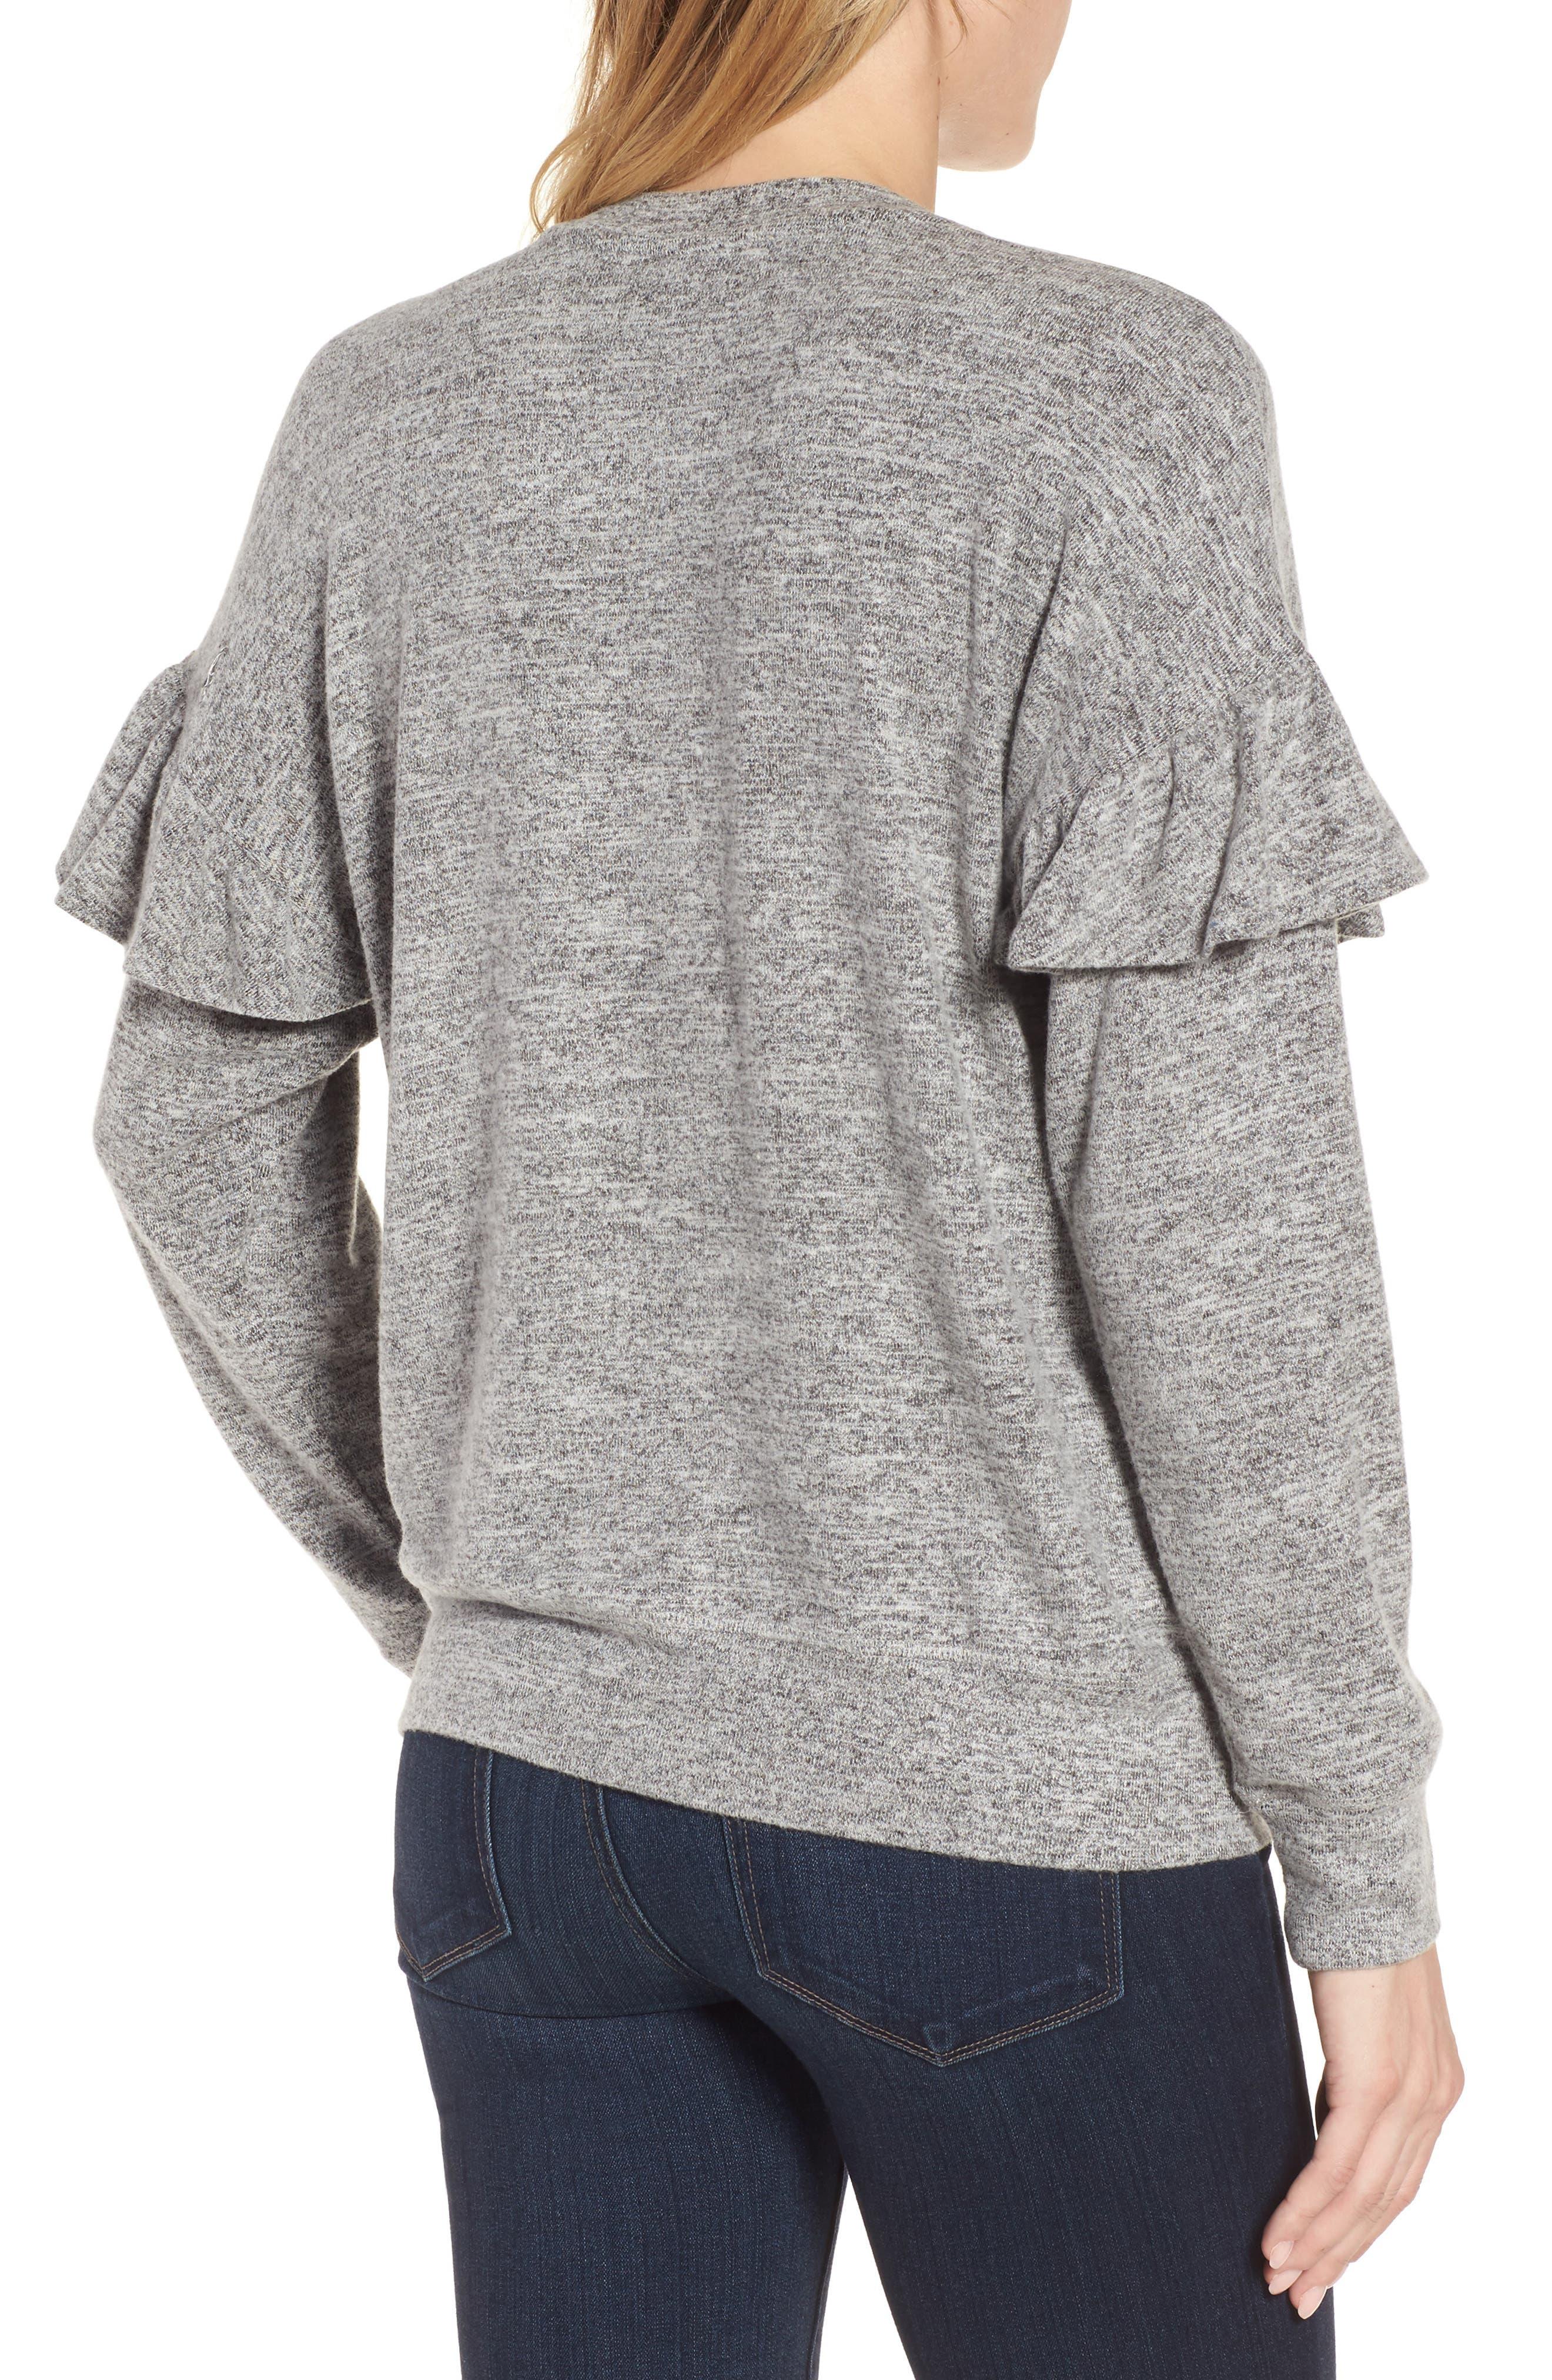 Ruffle Sleeve Sweatshirt,                             Alternate thumbnail 2, color,                             100